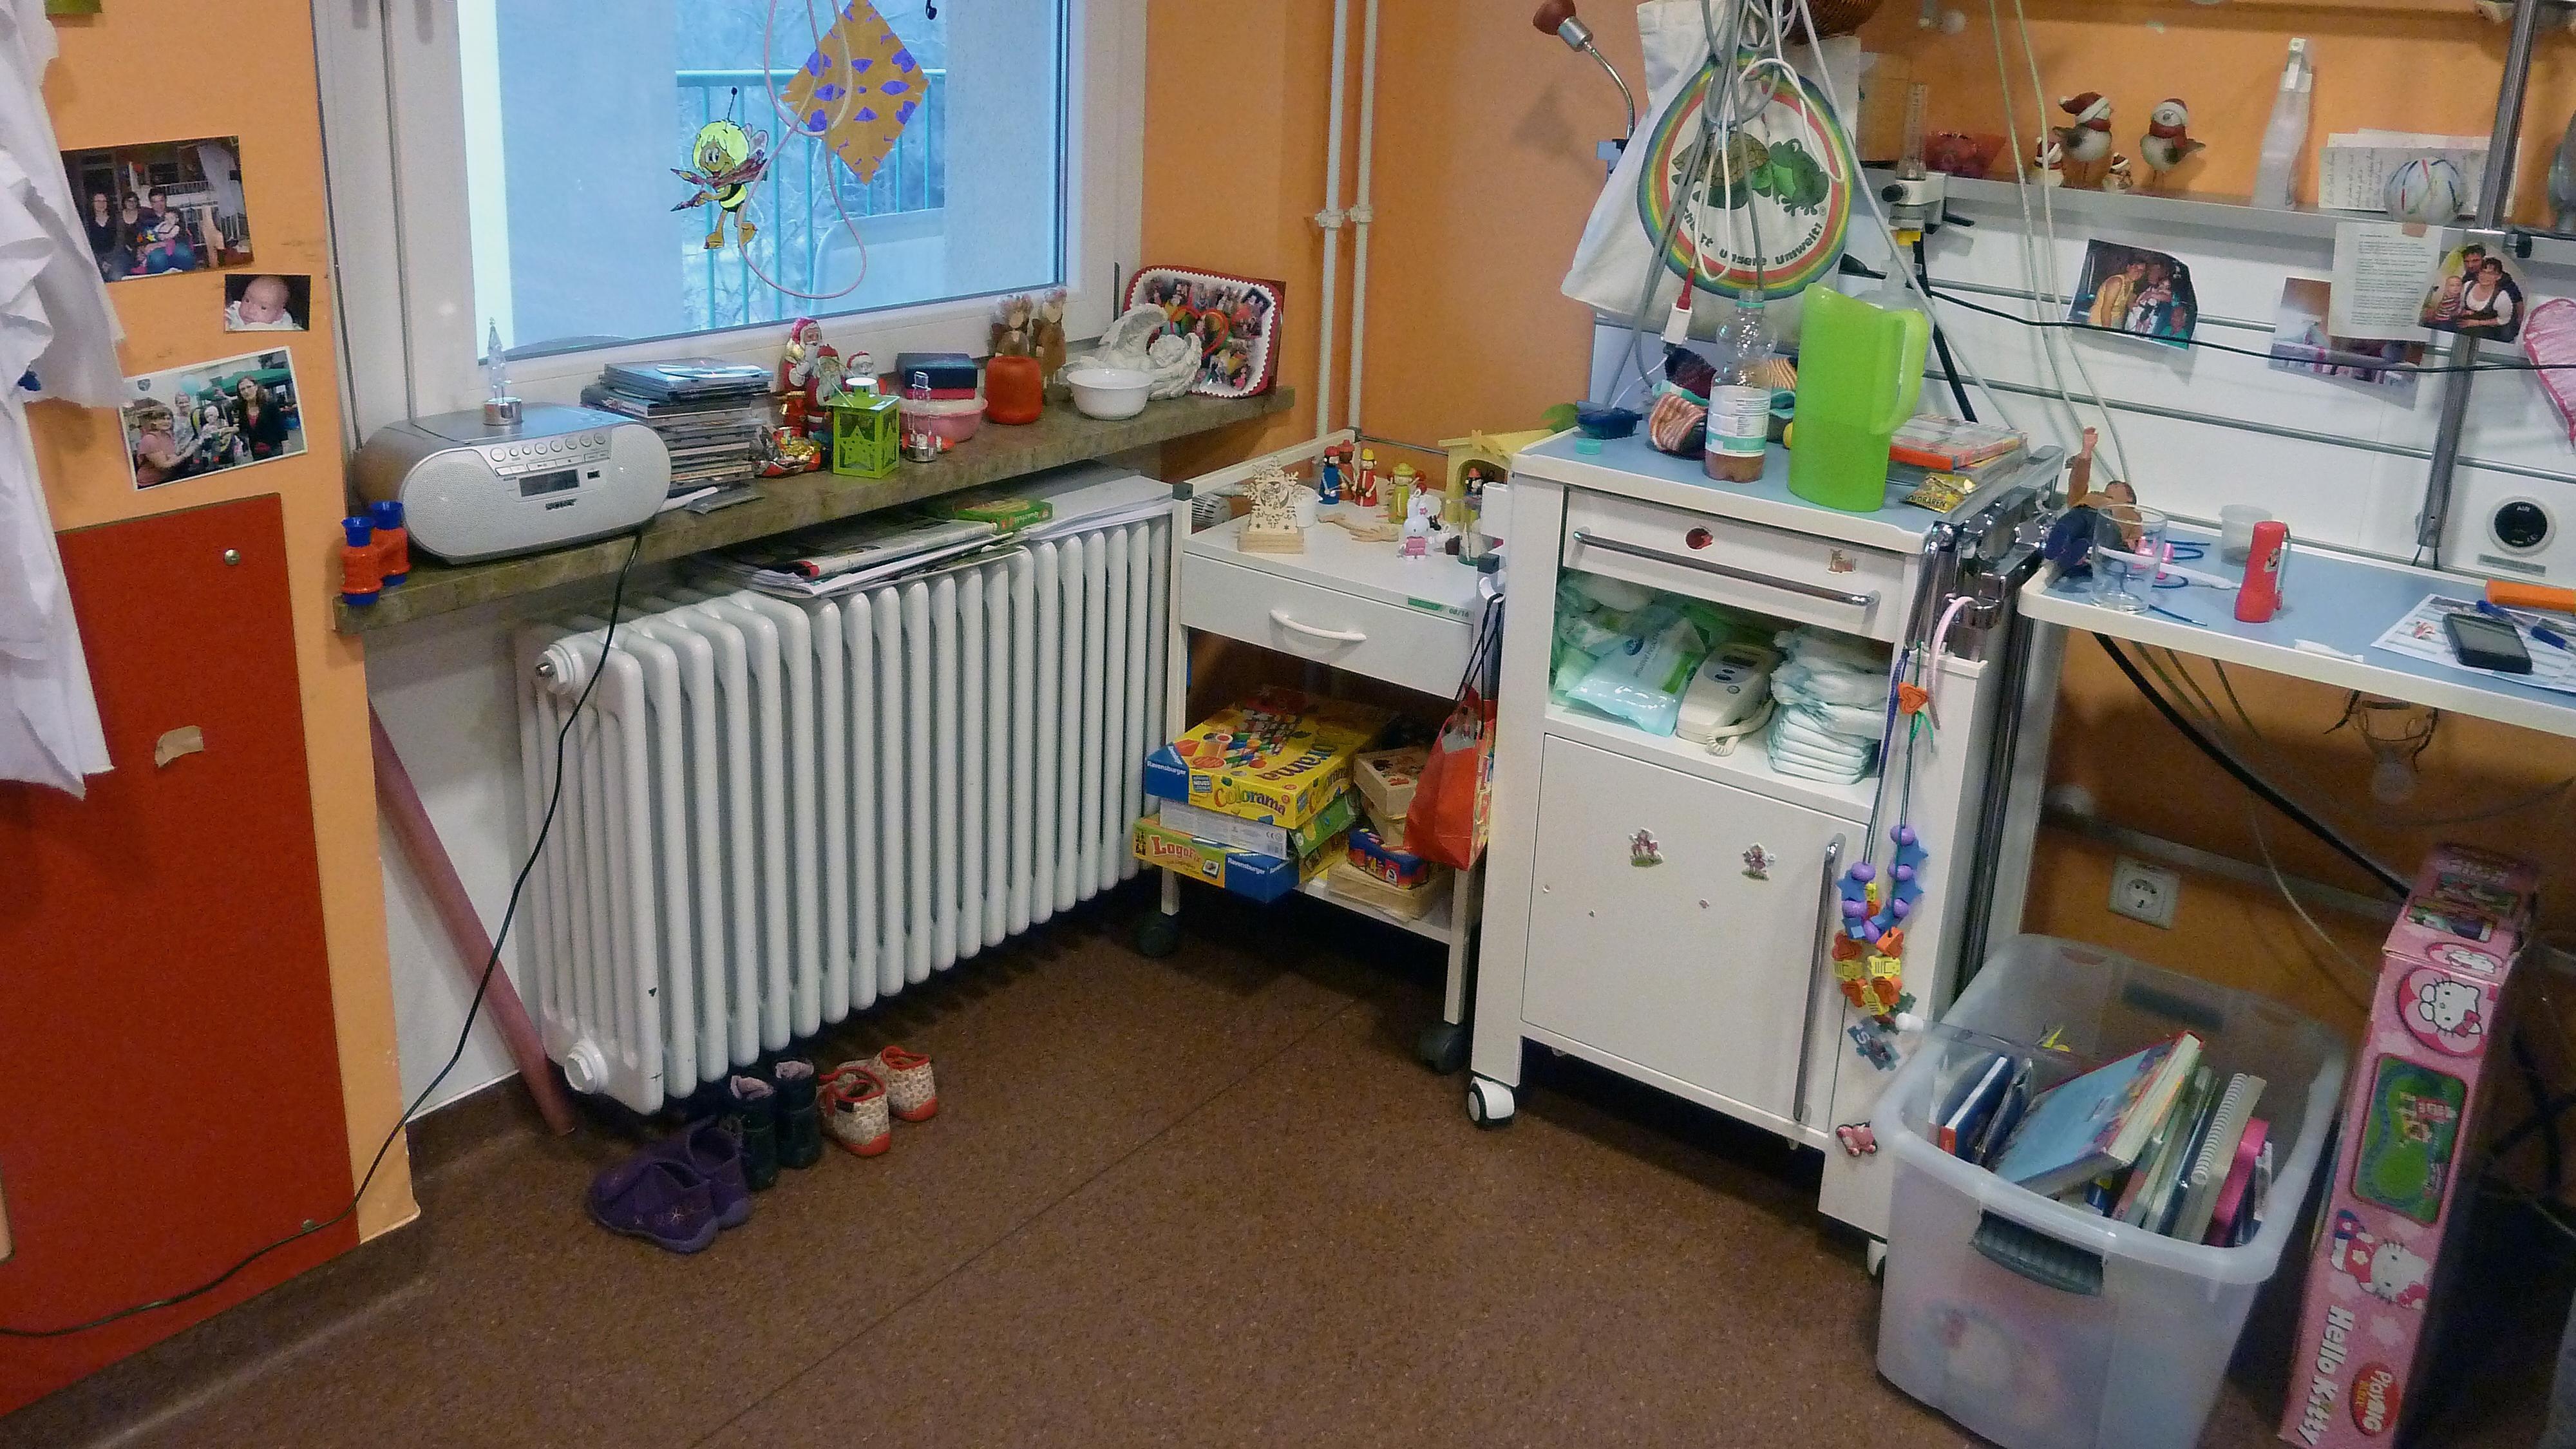 Kinder-Krankenzimmer